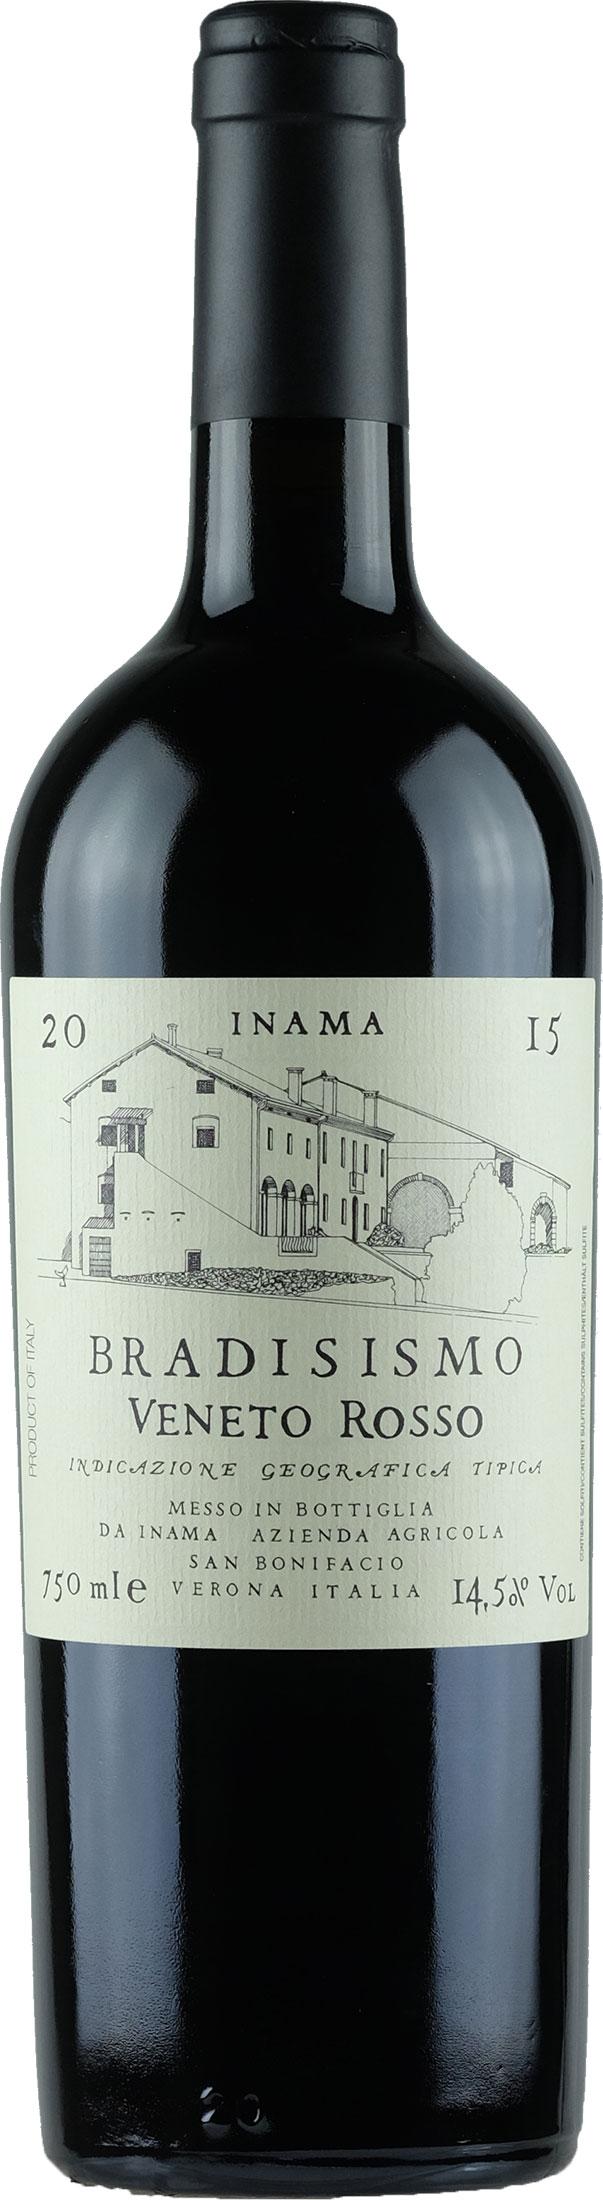 Vino rosso Bradisismo Veneto Rosso